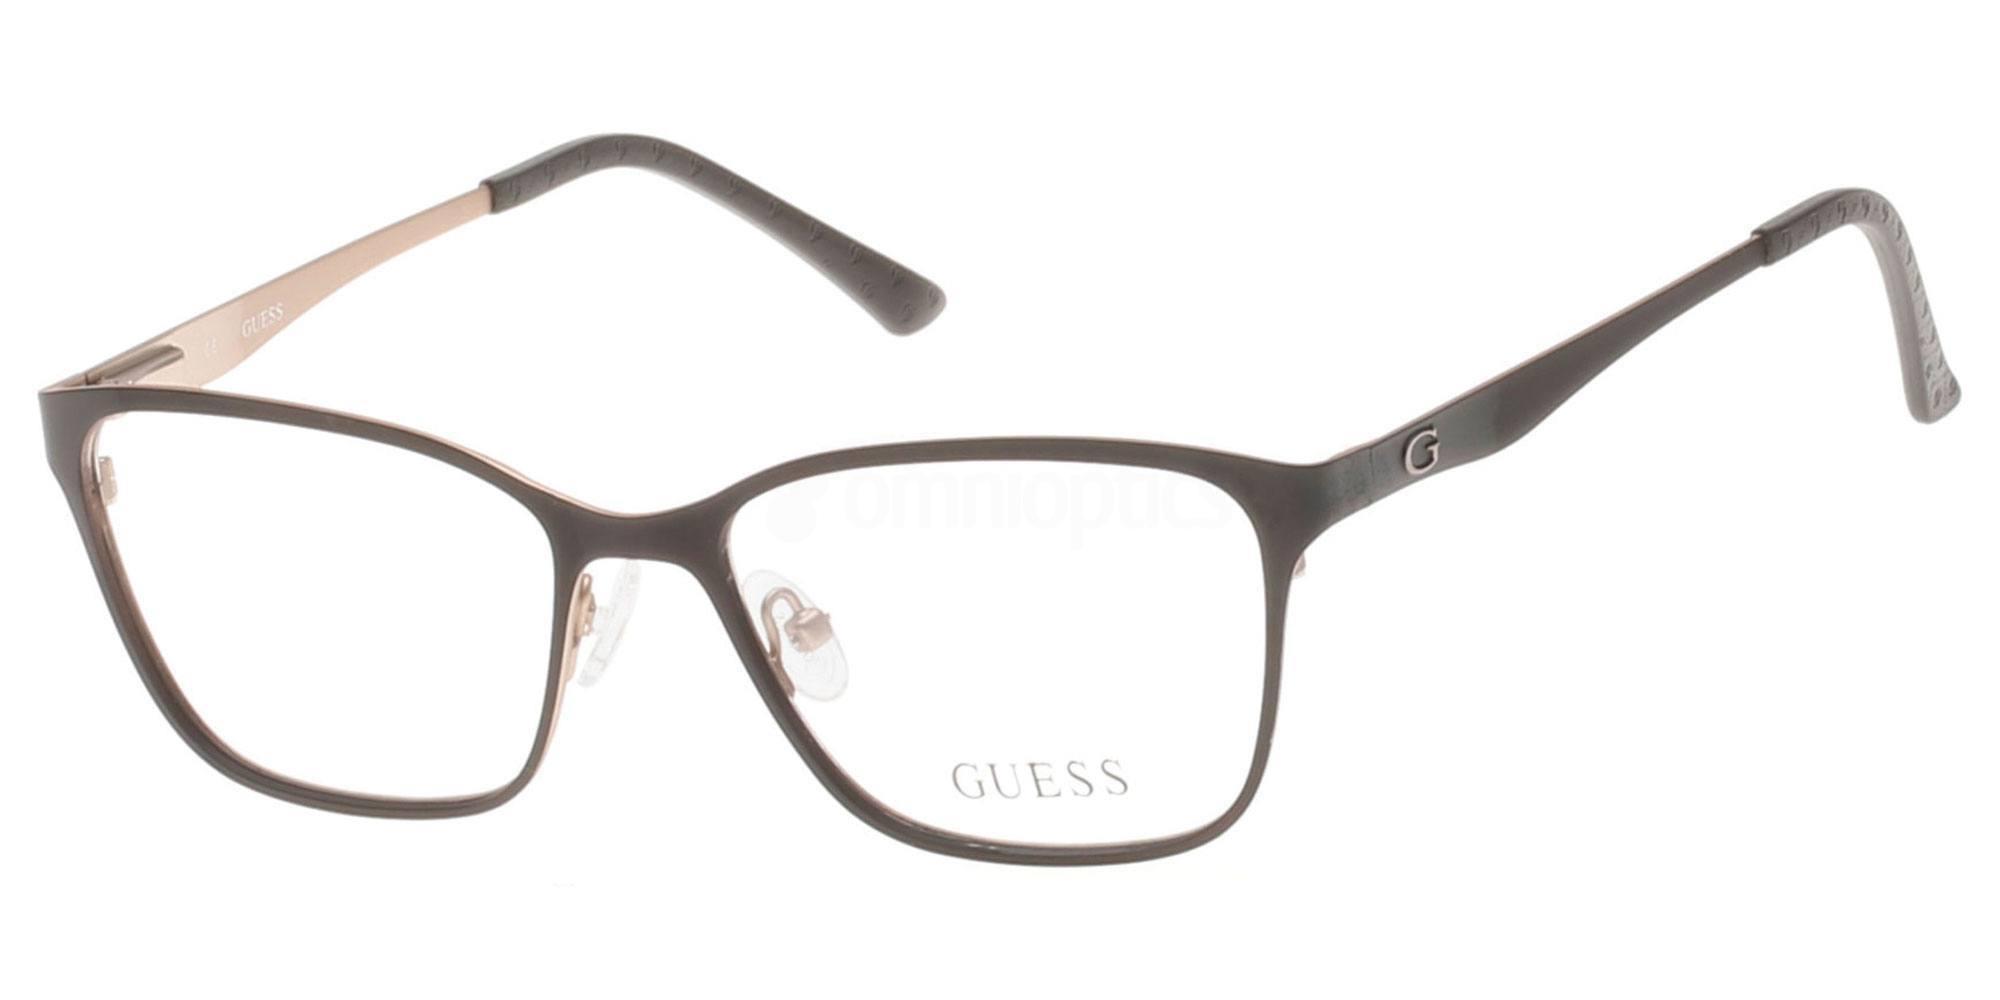 002 GU2511 , Guess